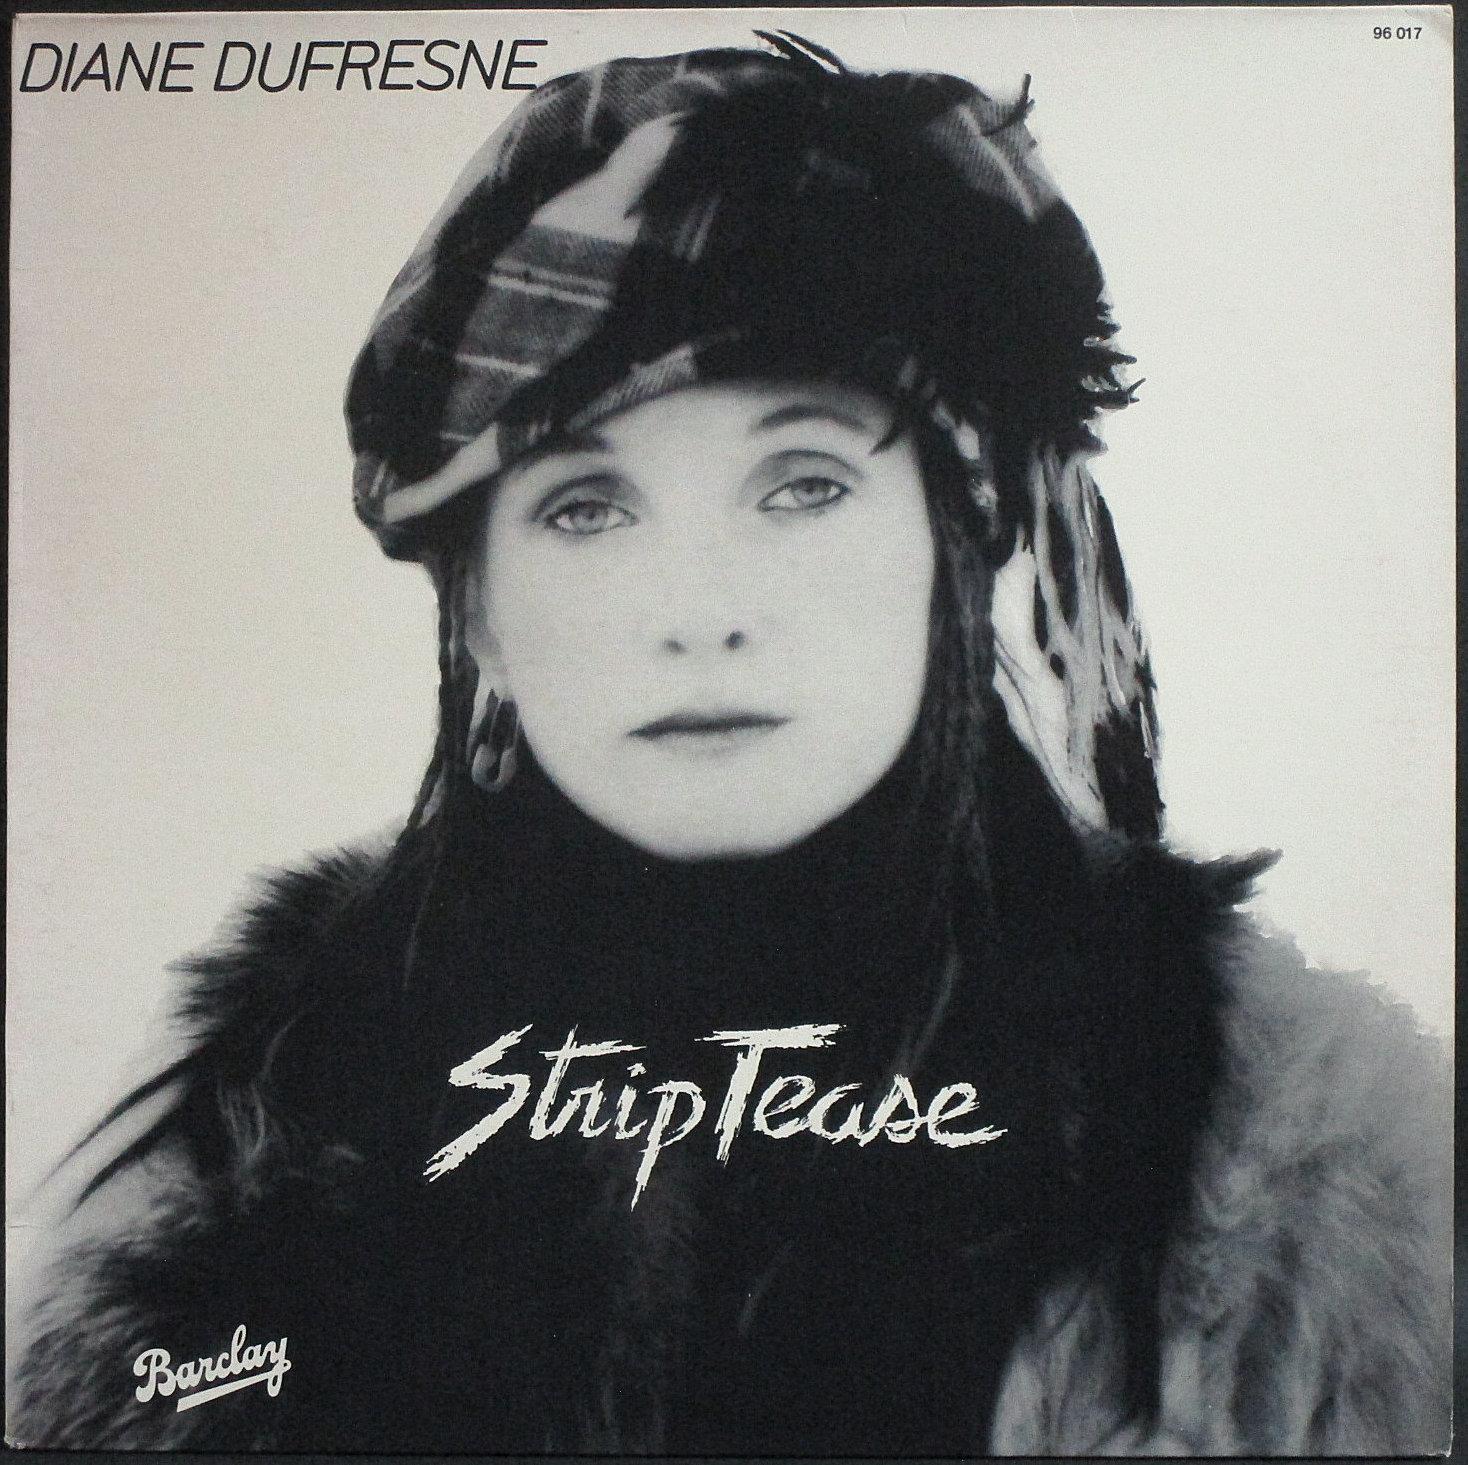 Diane Dufresne ディアーヌ・デュフレーヌ / Strip Tease   FRA盤